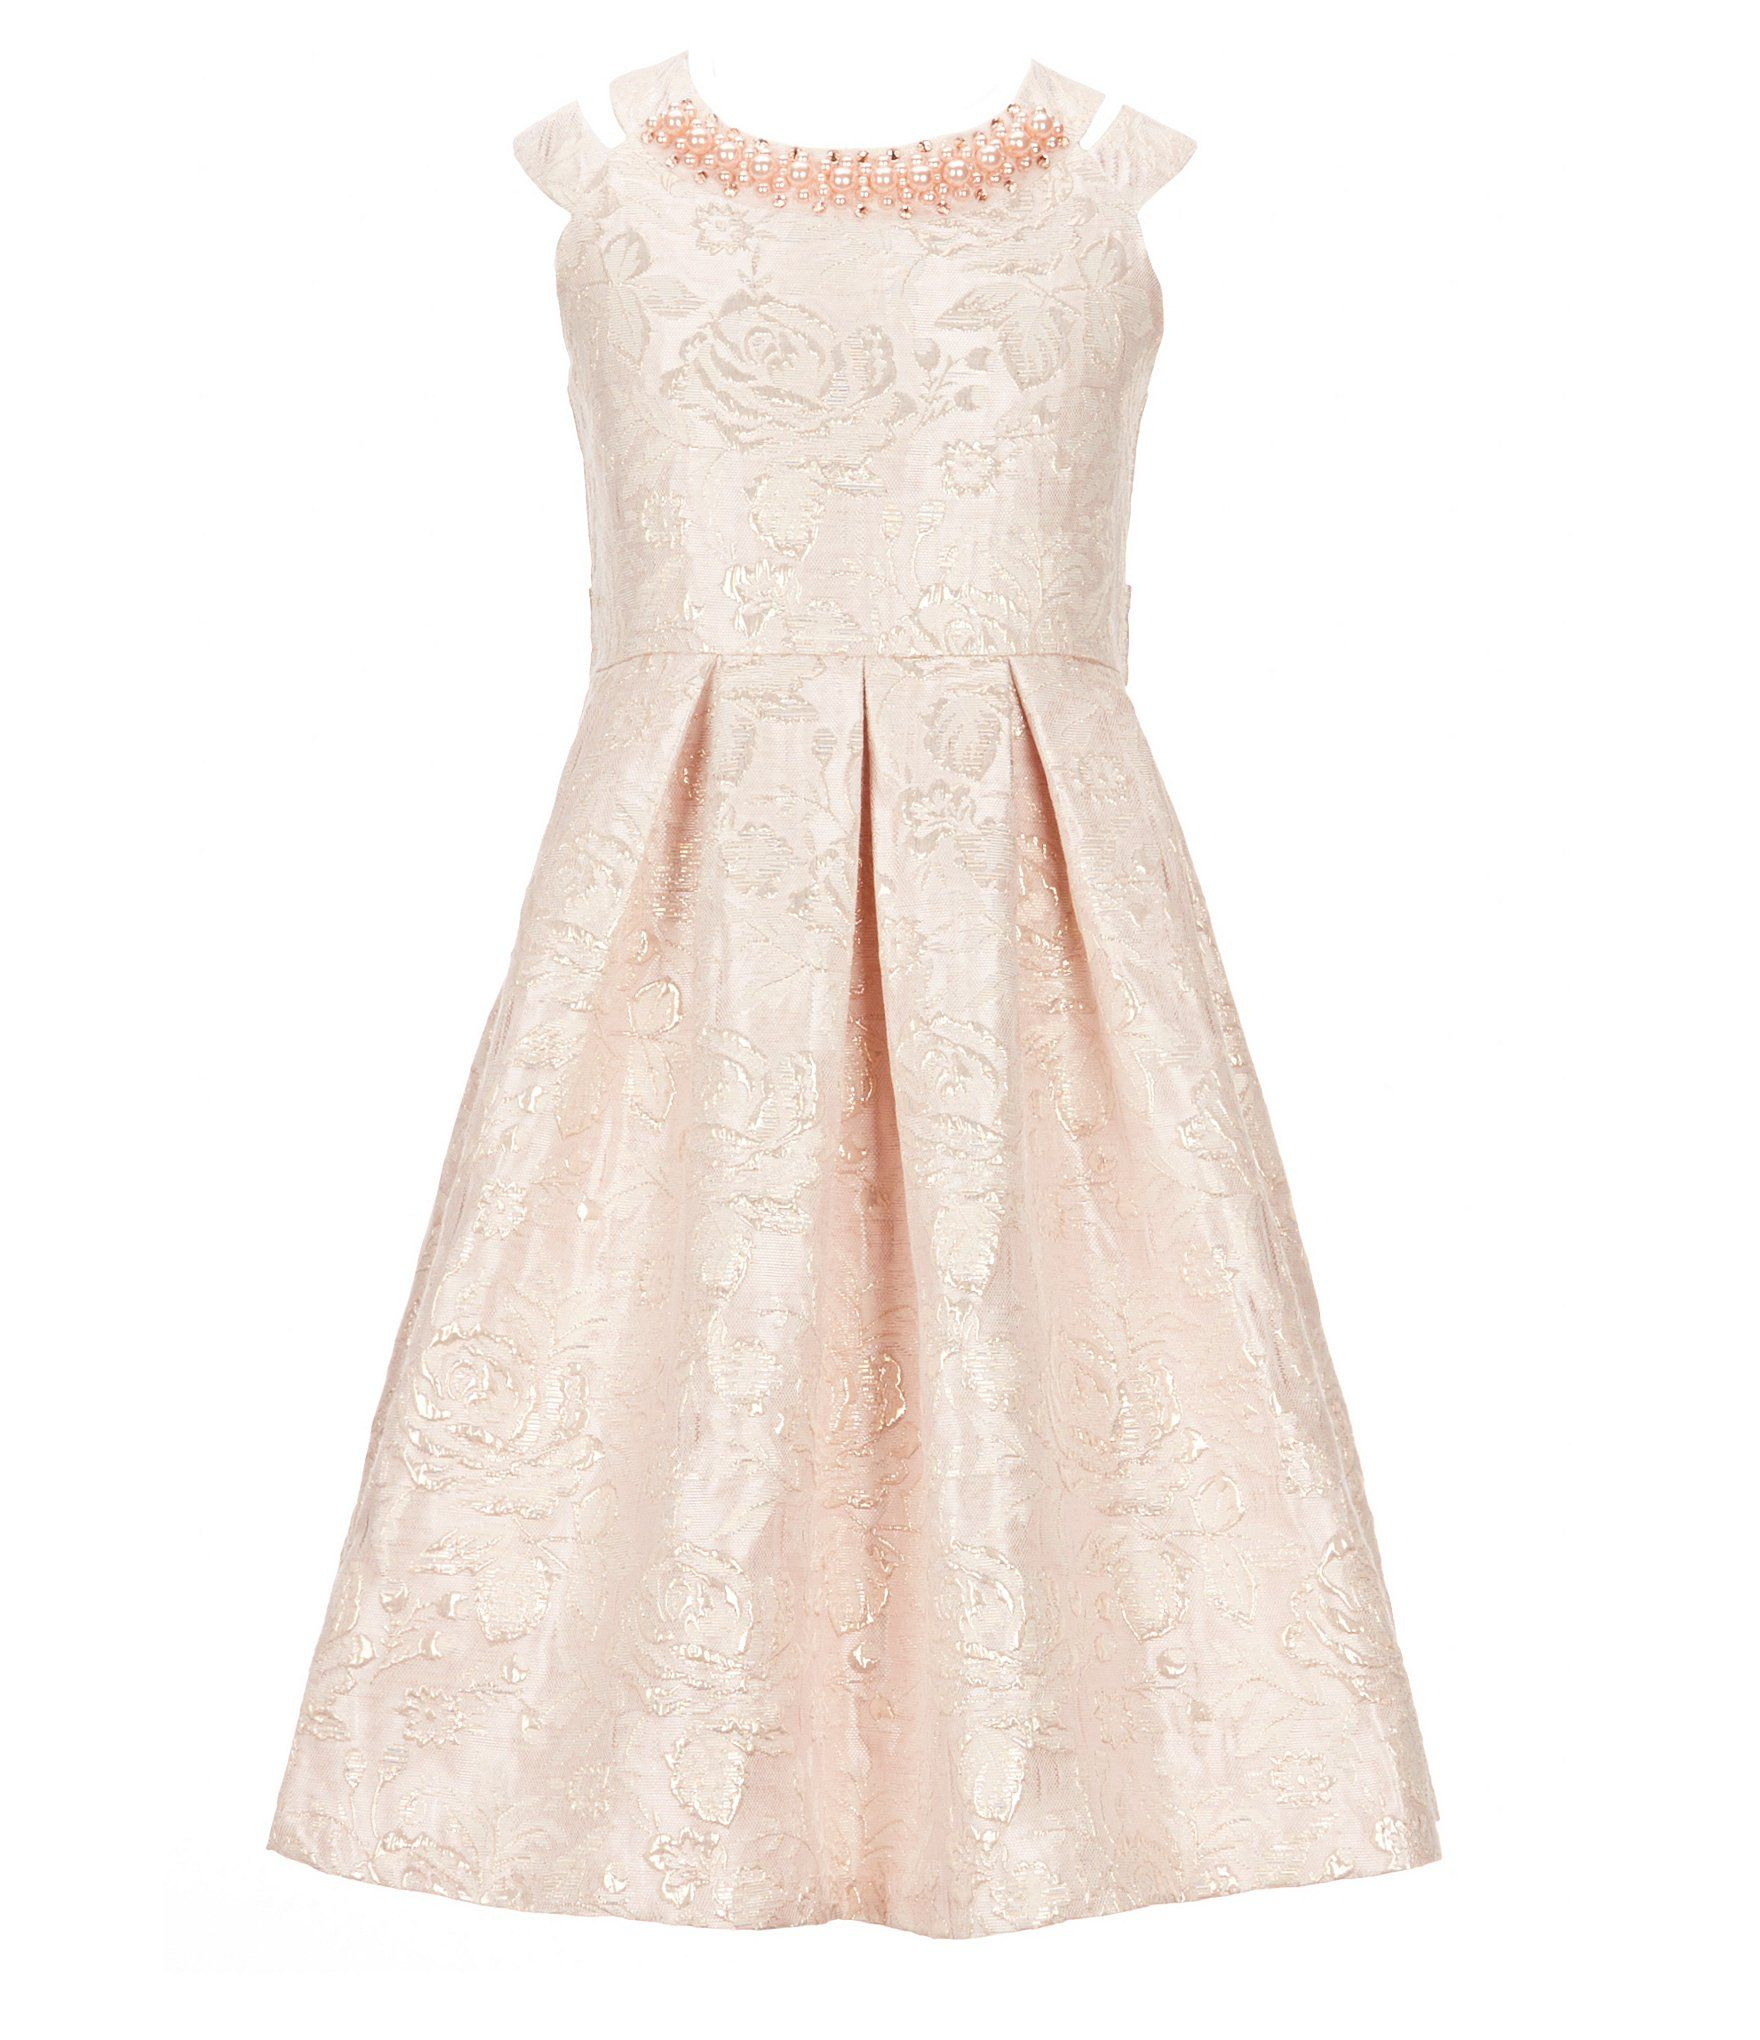 Bonnie jean big girls brocade doublestrap dress